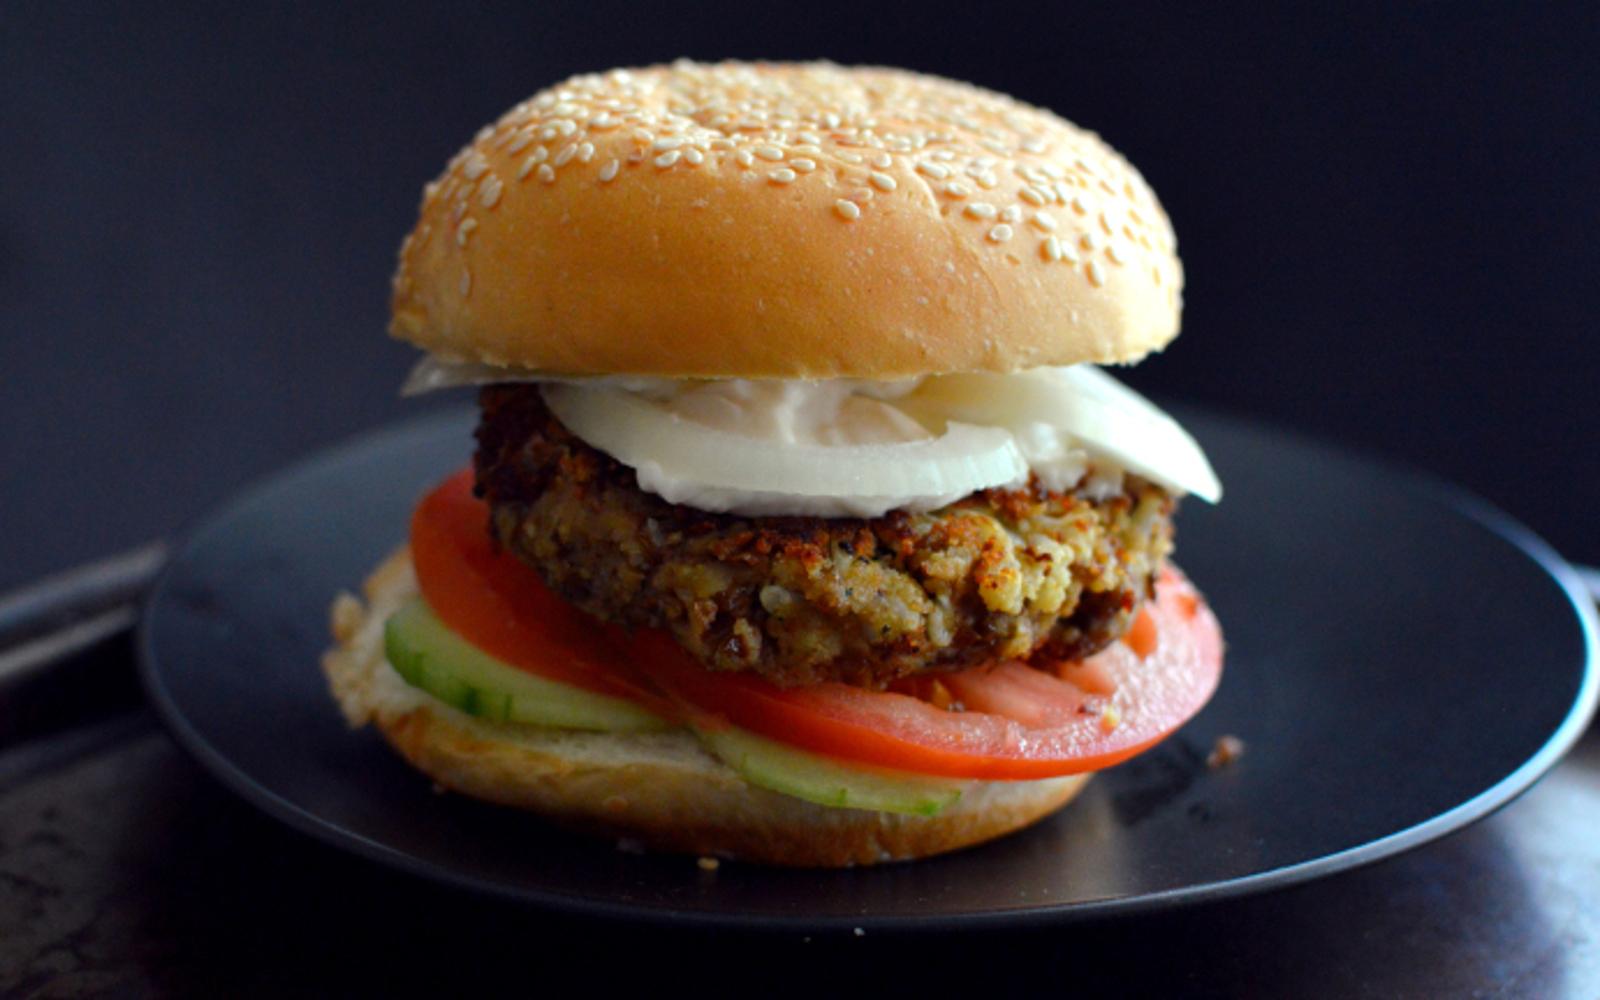 Cauliflower Lentil Burger